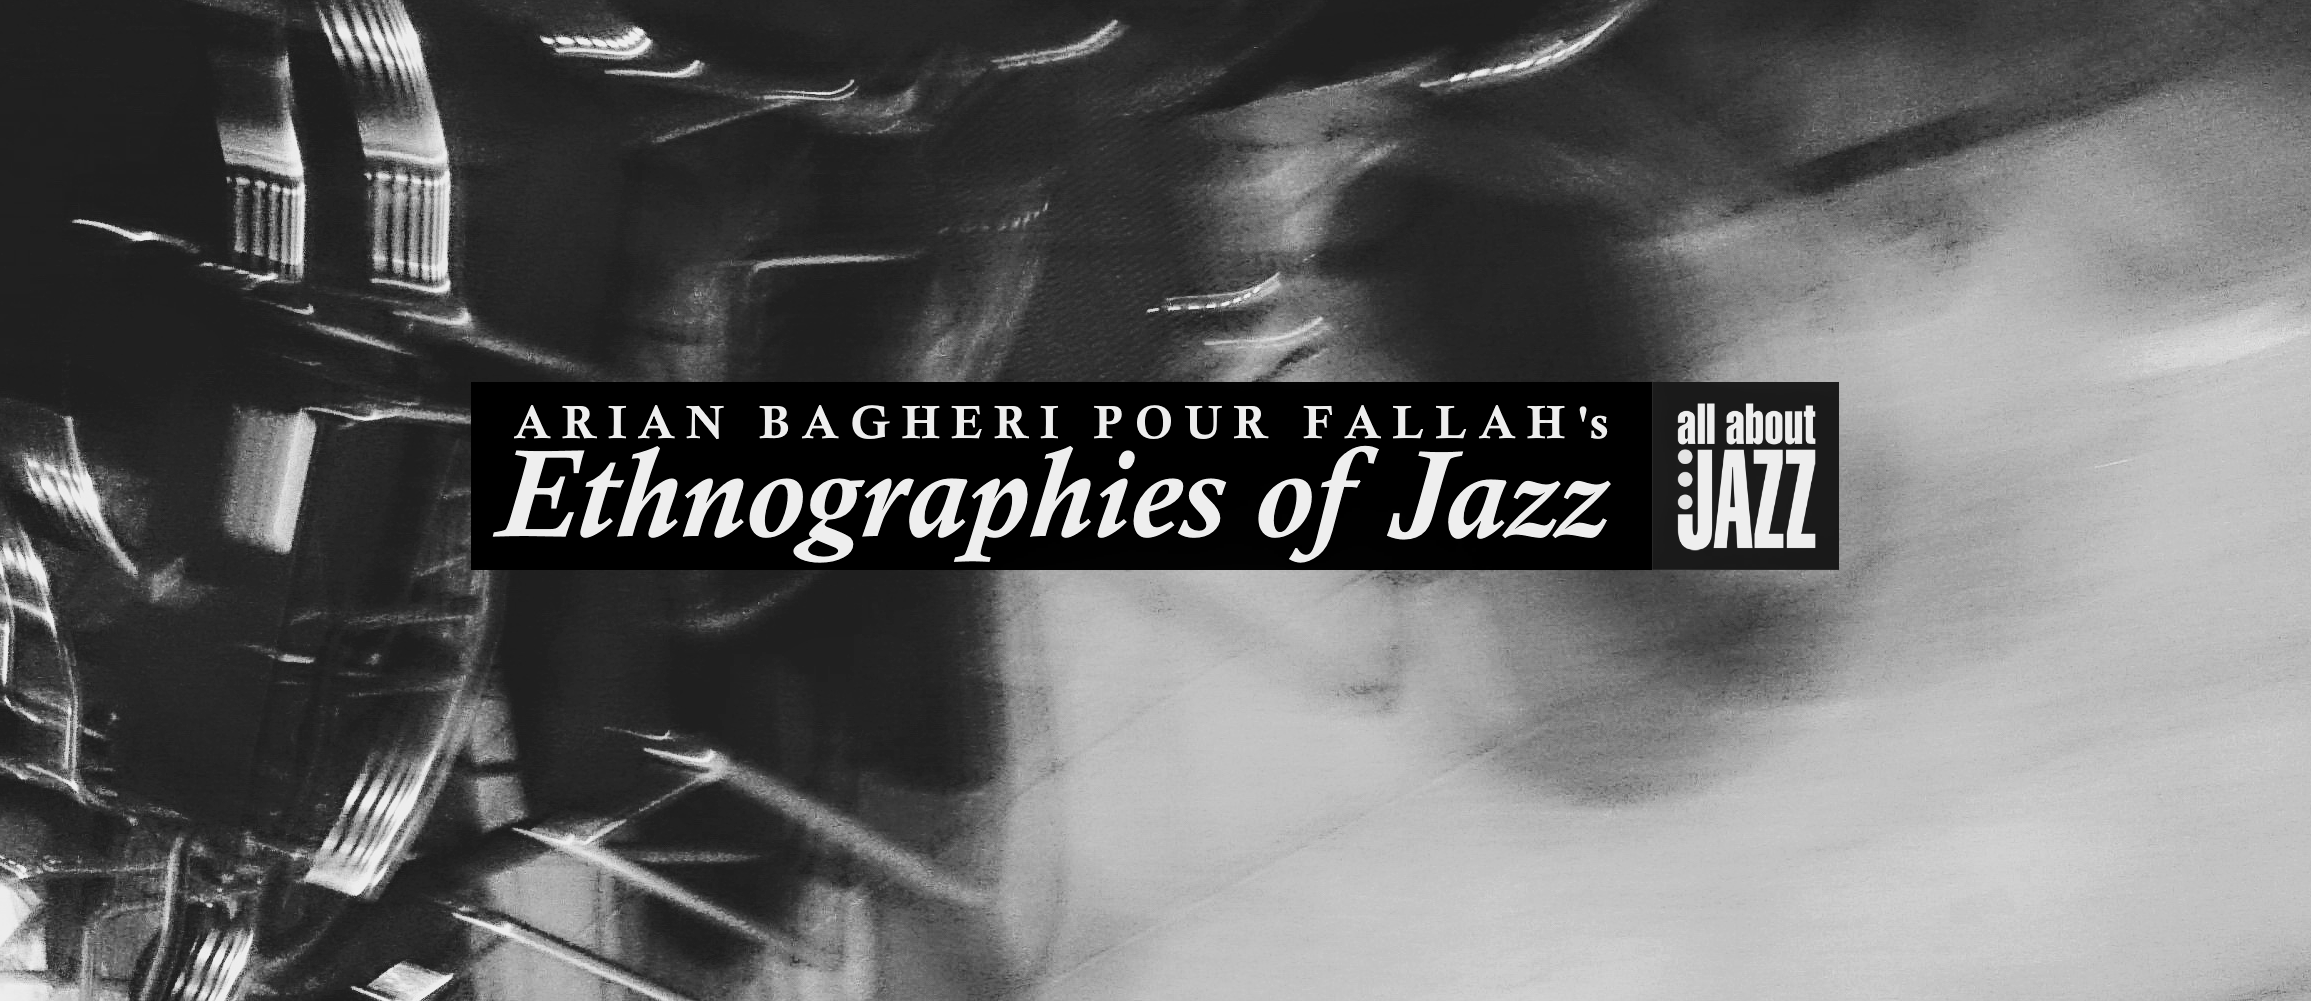 Arian Bagheri Pour Fallah's Ethnographies of Jazz